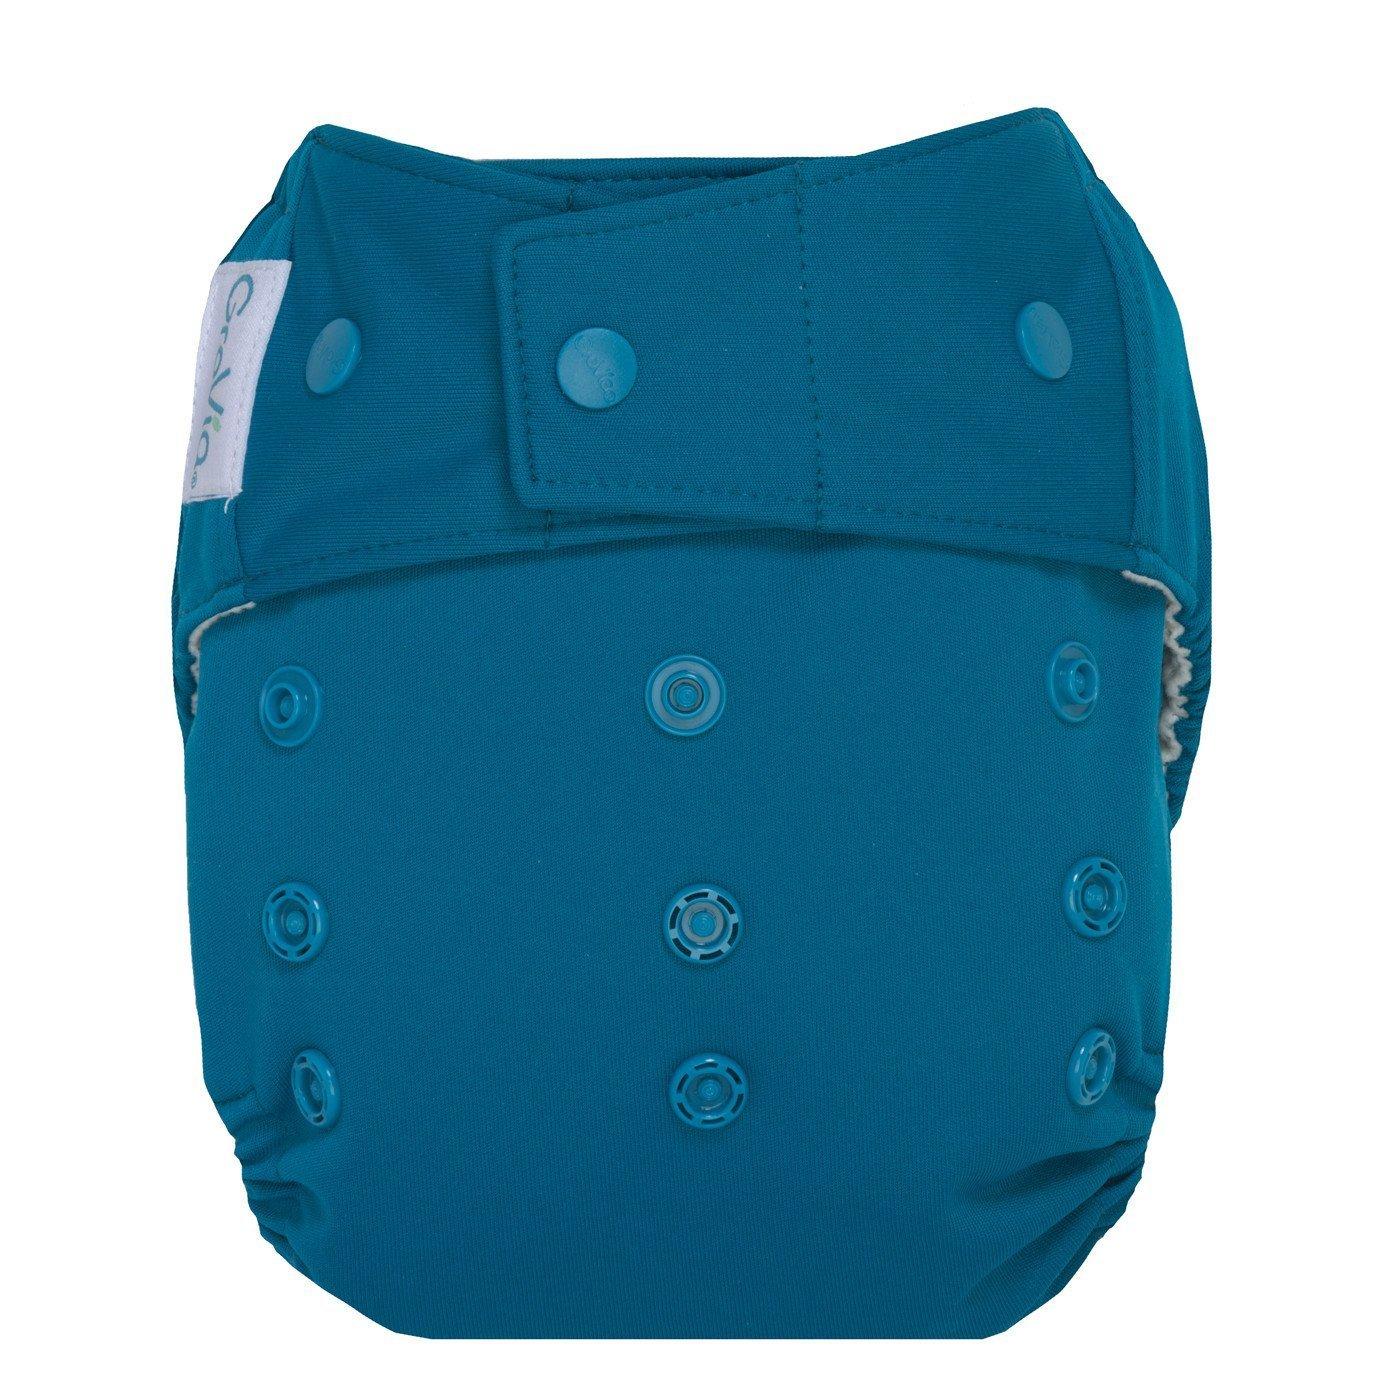 GroVia Hybrid Cloth Diaper Shell, Snap Shell (Abalone)